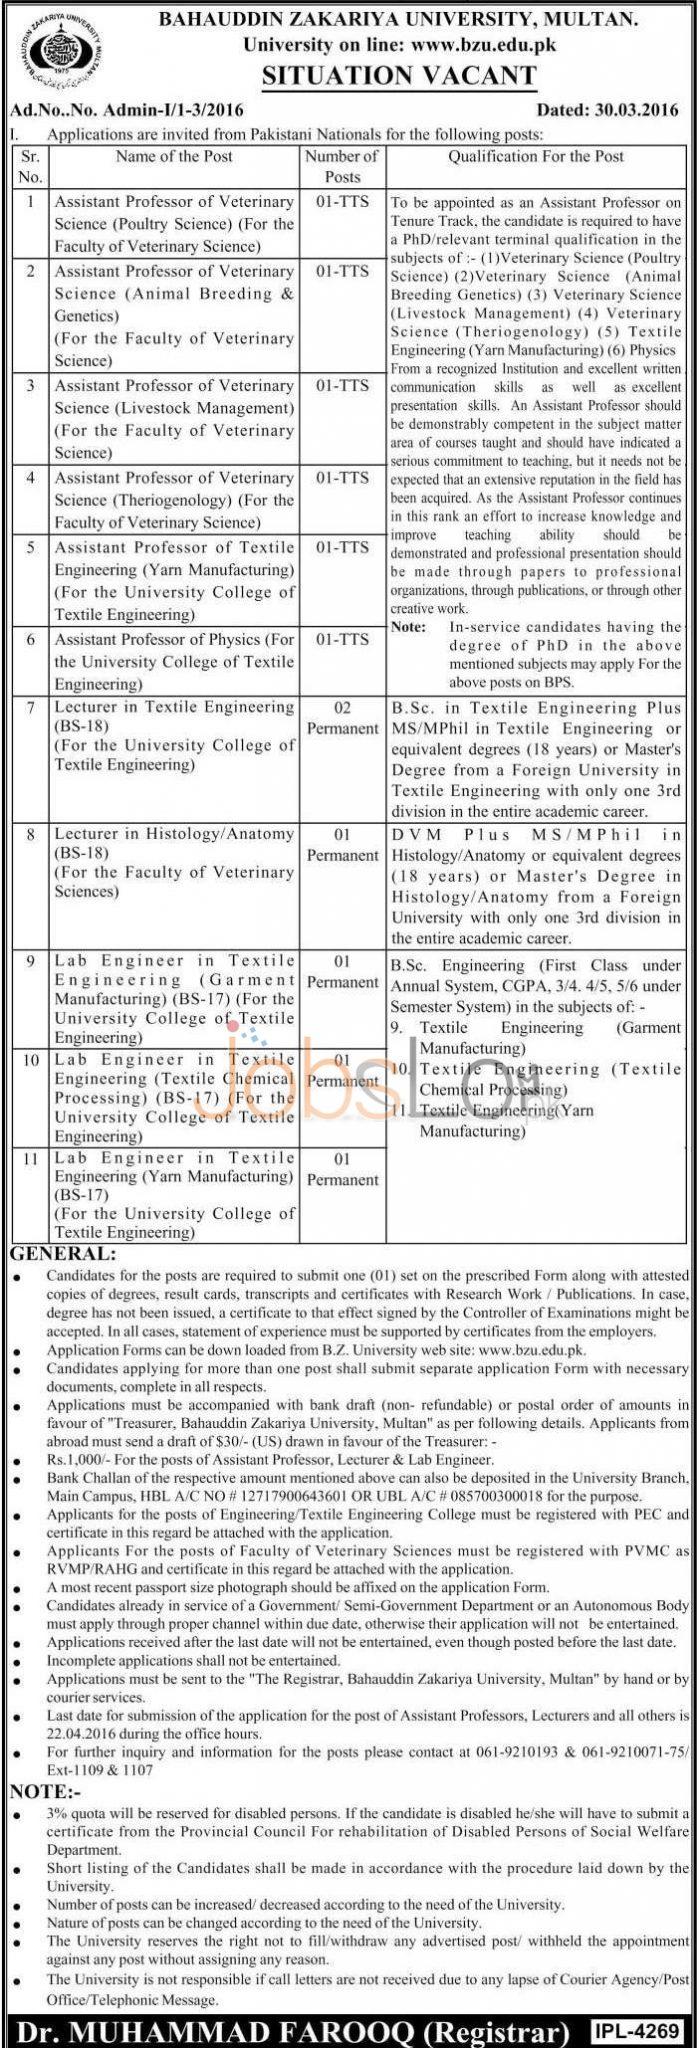 Bahauddin Zakariya University Multan Jobs April 2016 Application Form www.bzu.edu.pk